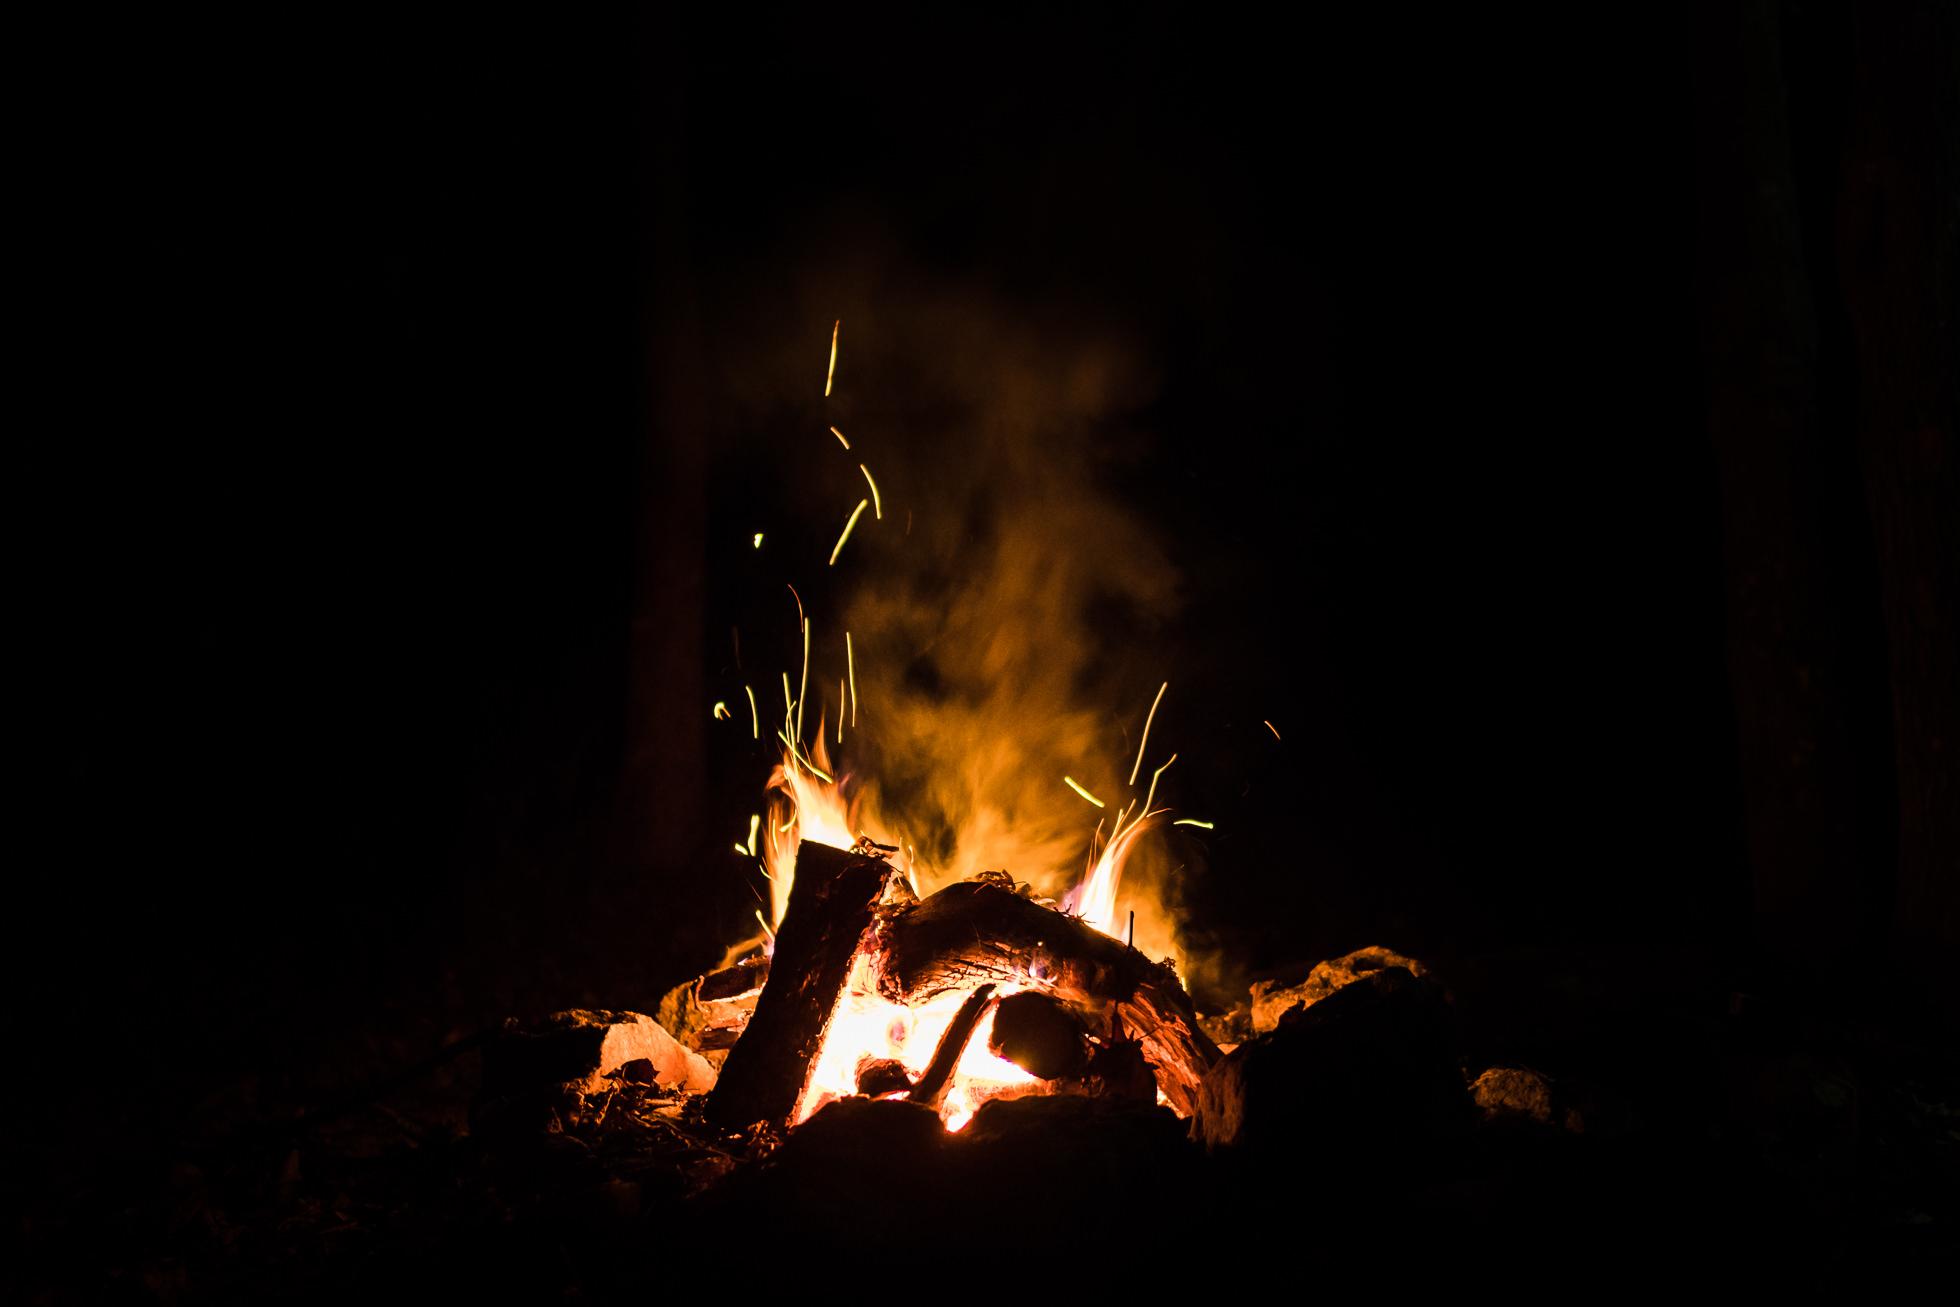 campfire, night photography